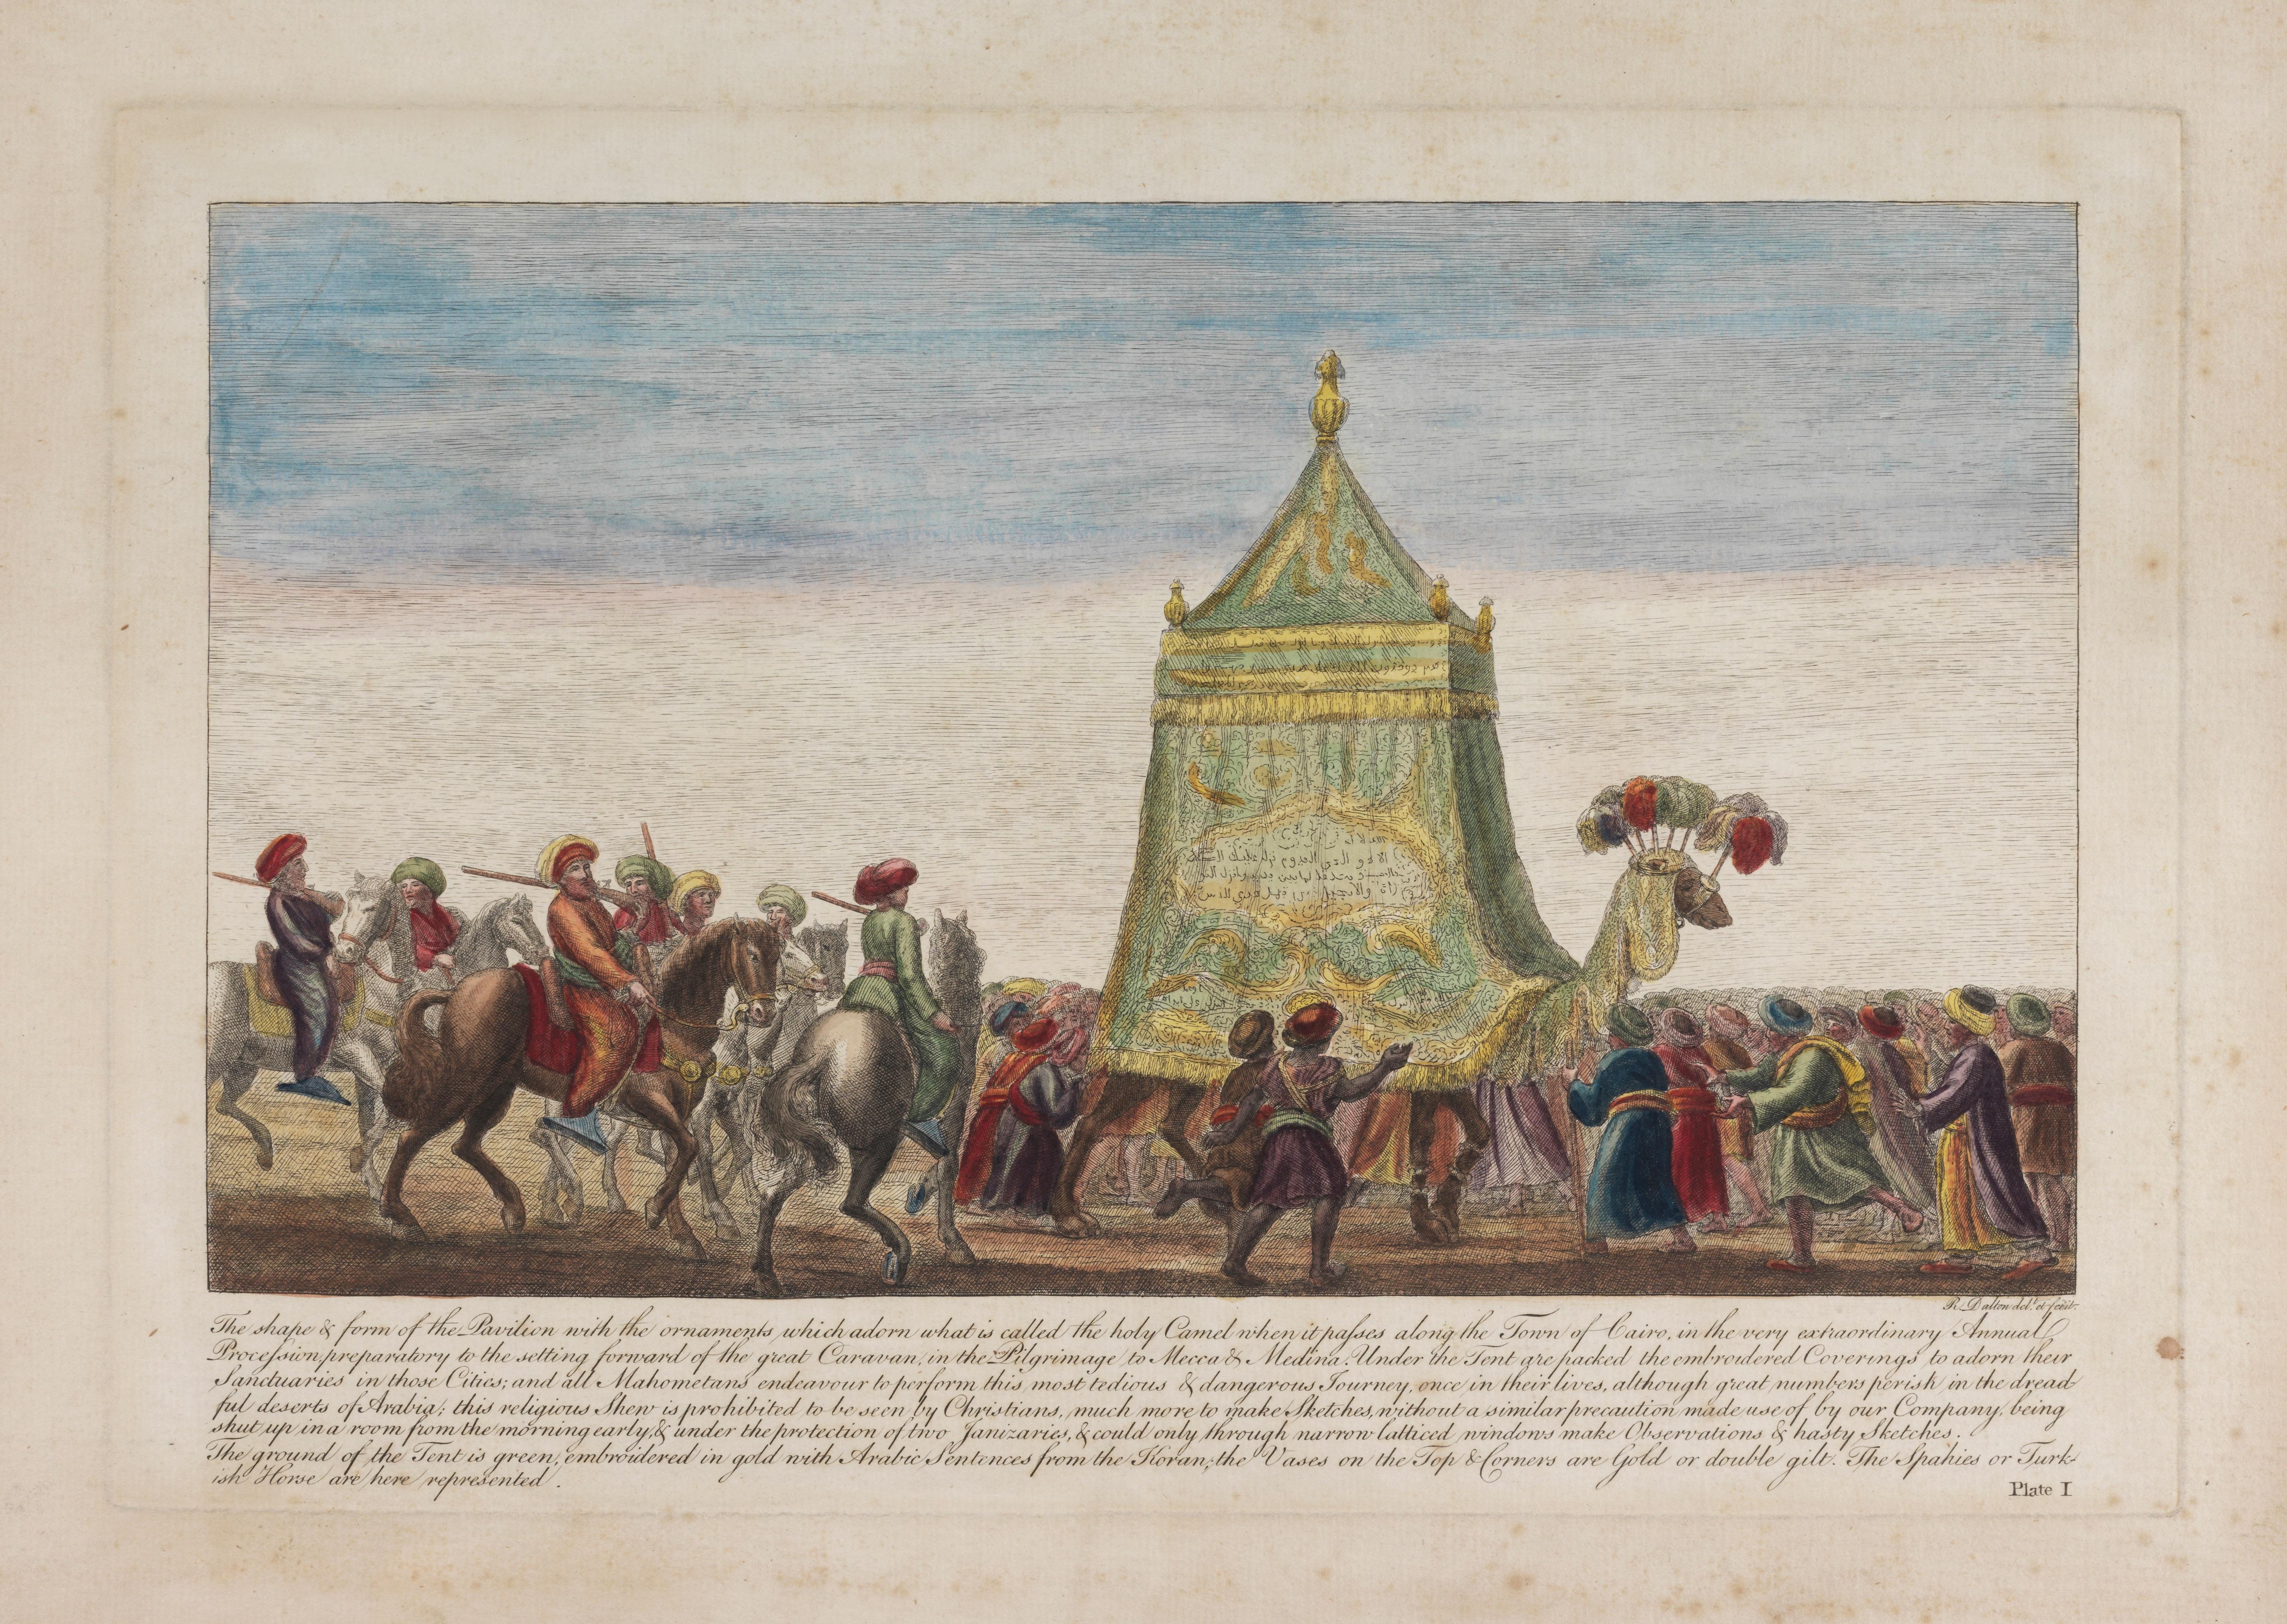 The Mahmal Passing Through Cairo by Richard Dalton